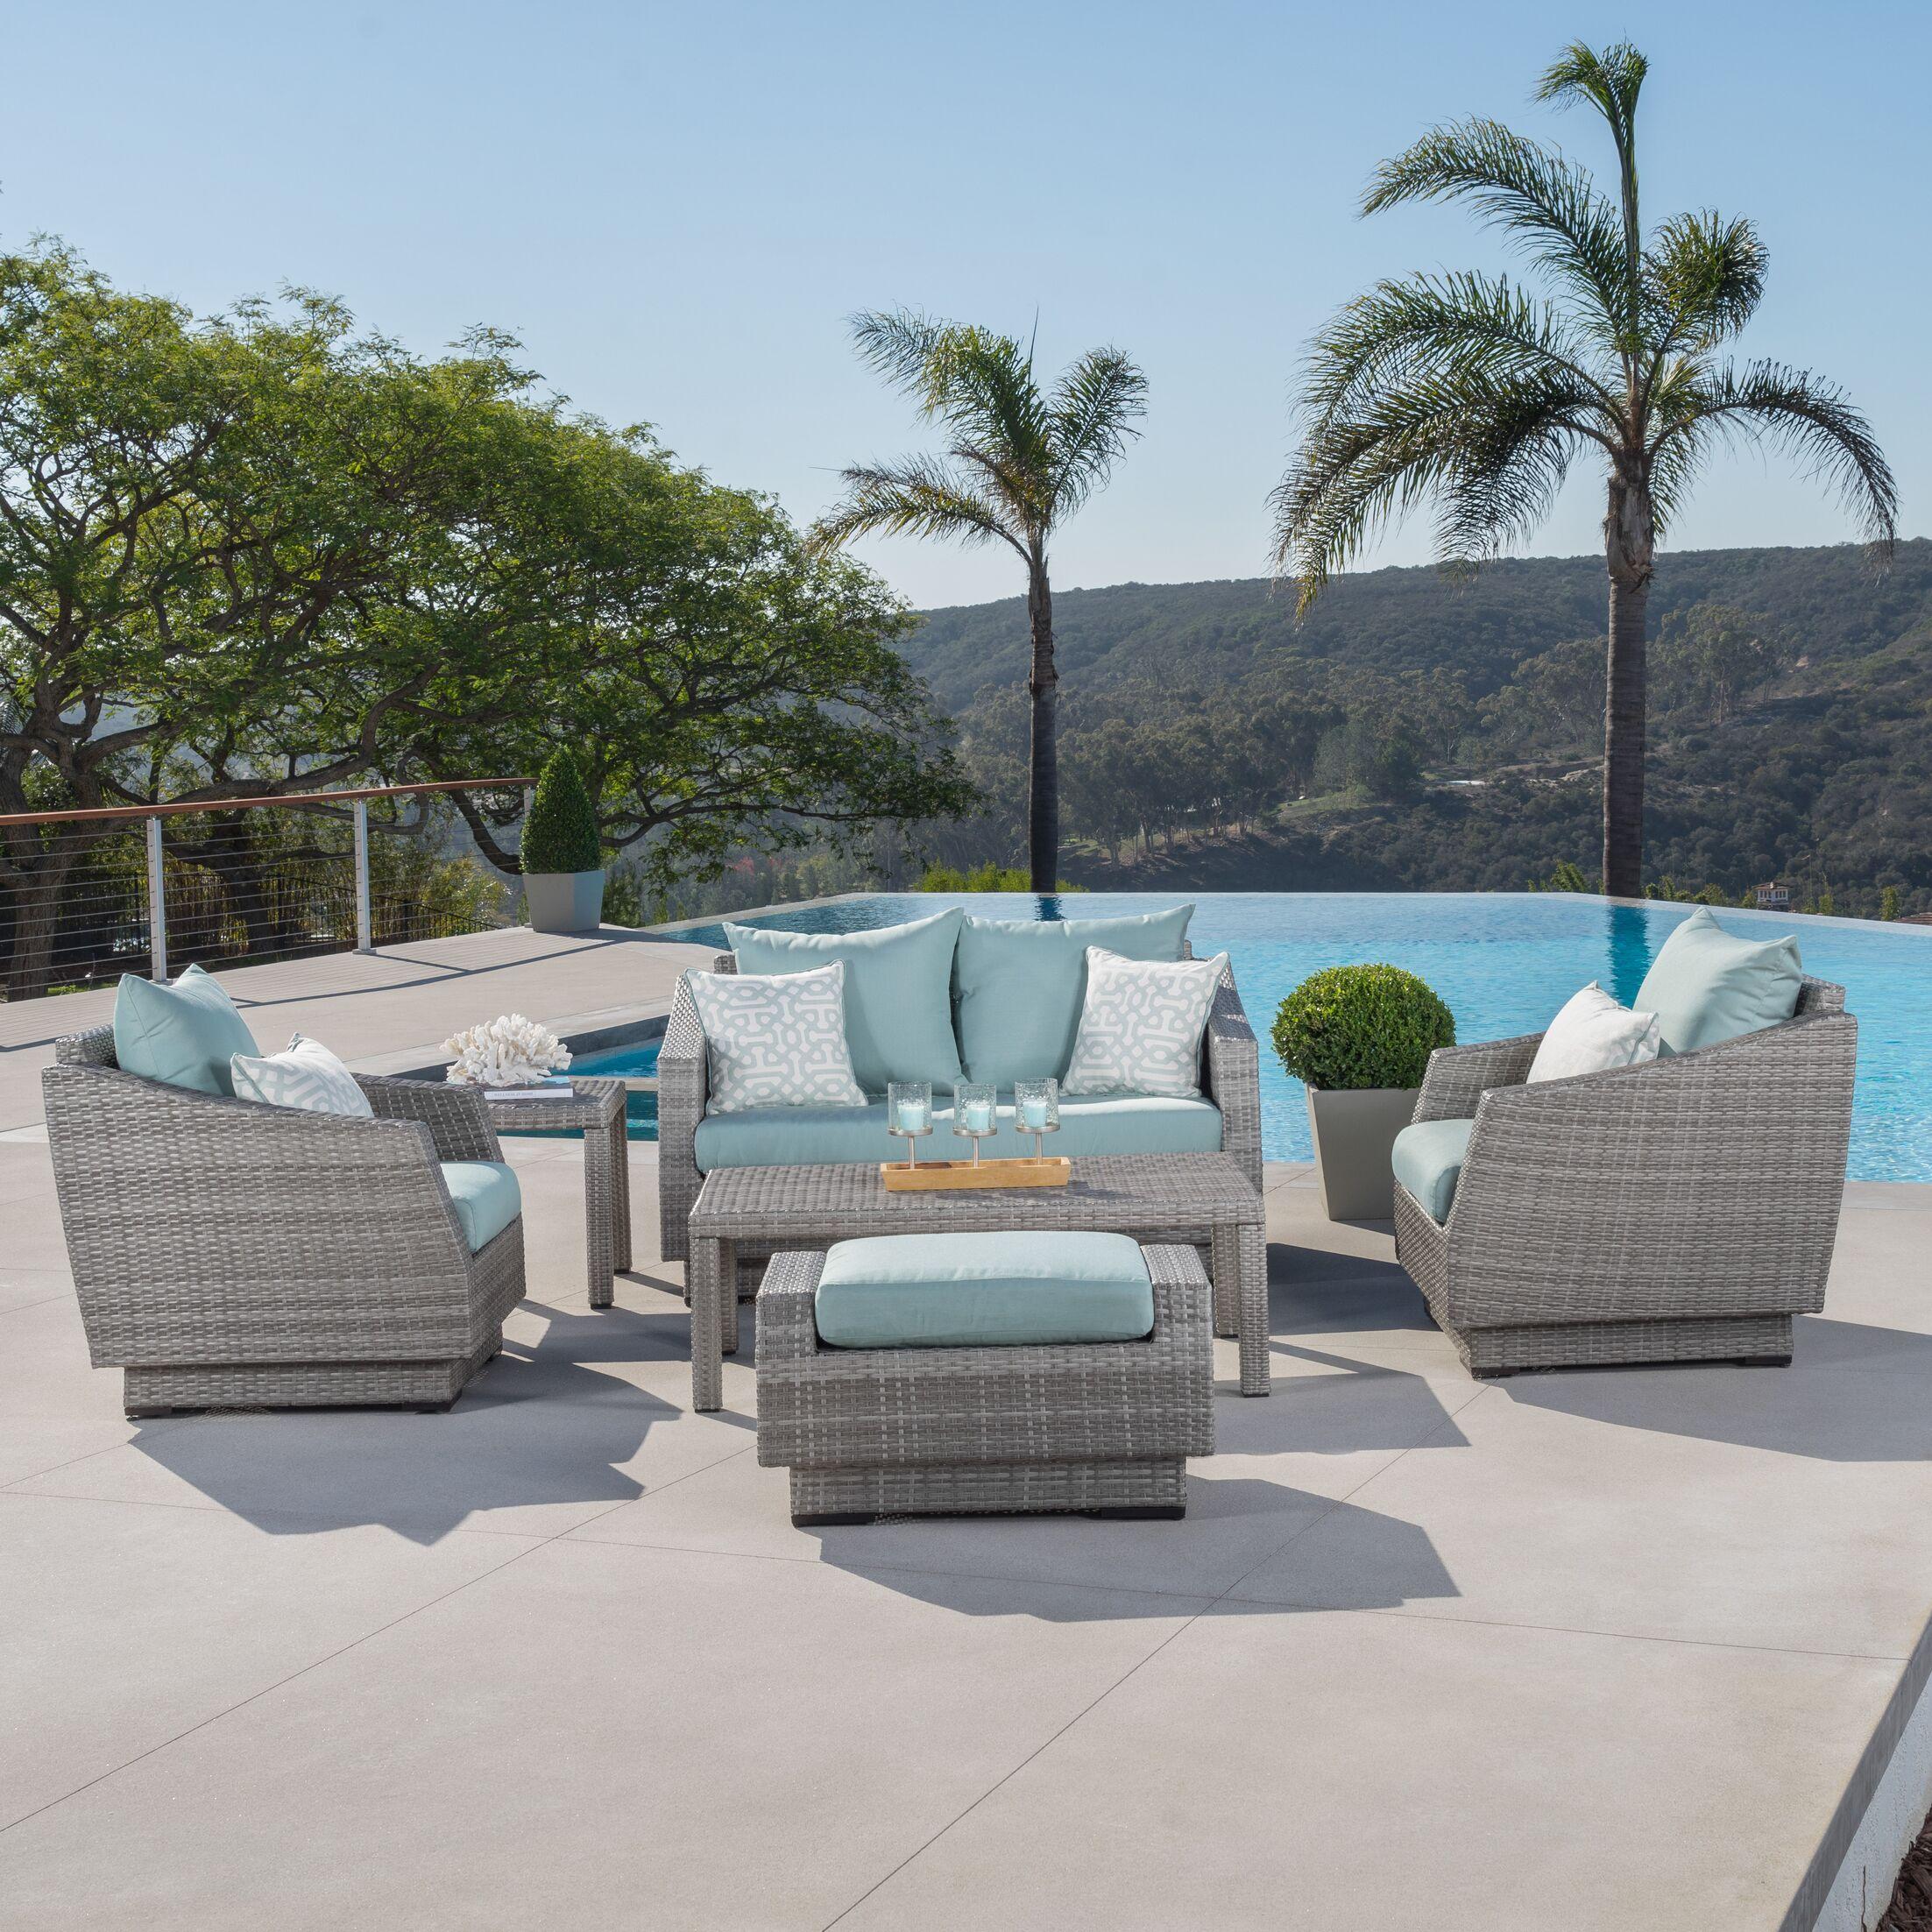 Castelli 6 Piece Sofa Set with Cushions Fabric: Spa Blue